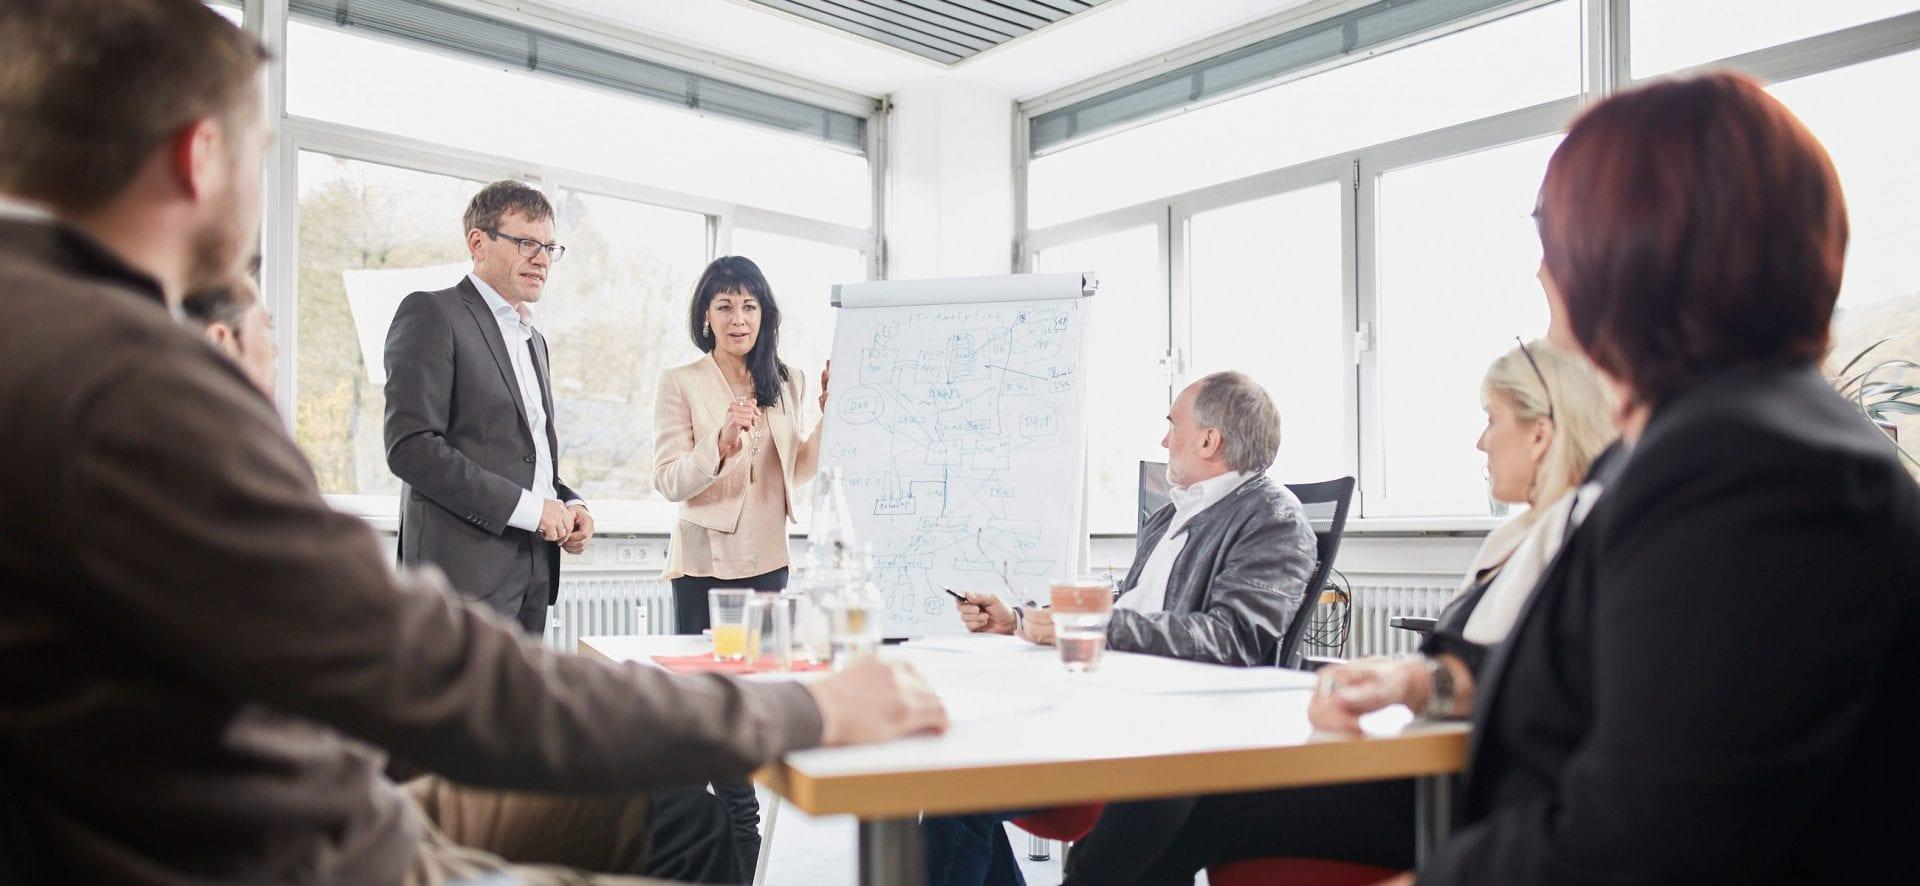 kunden kaltakquise coaching Vertriebsagentur